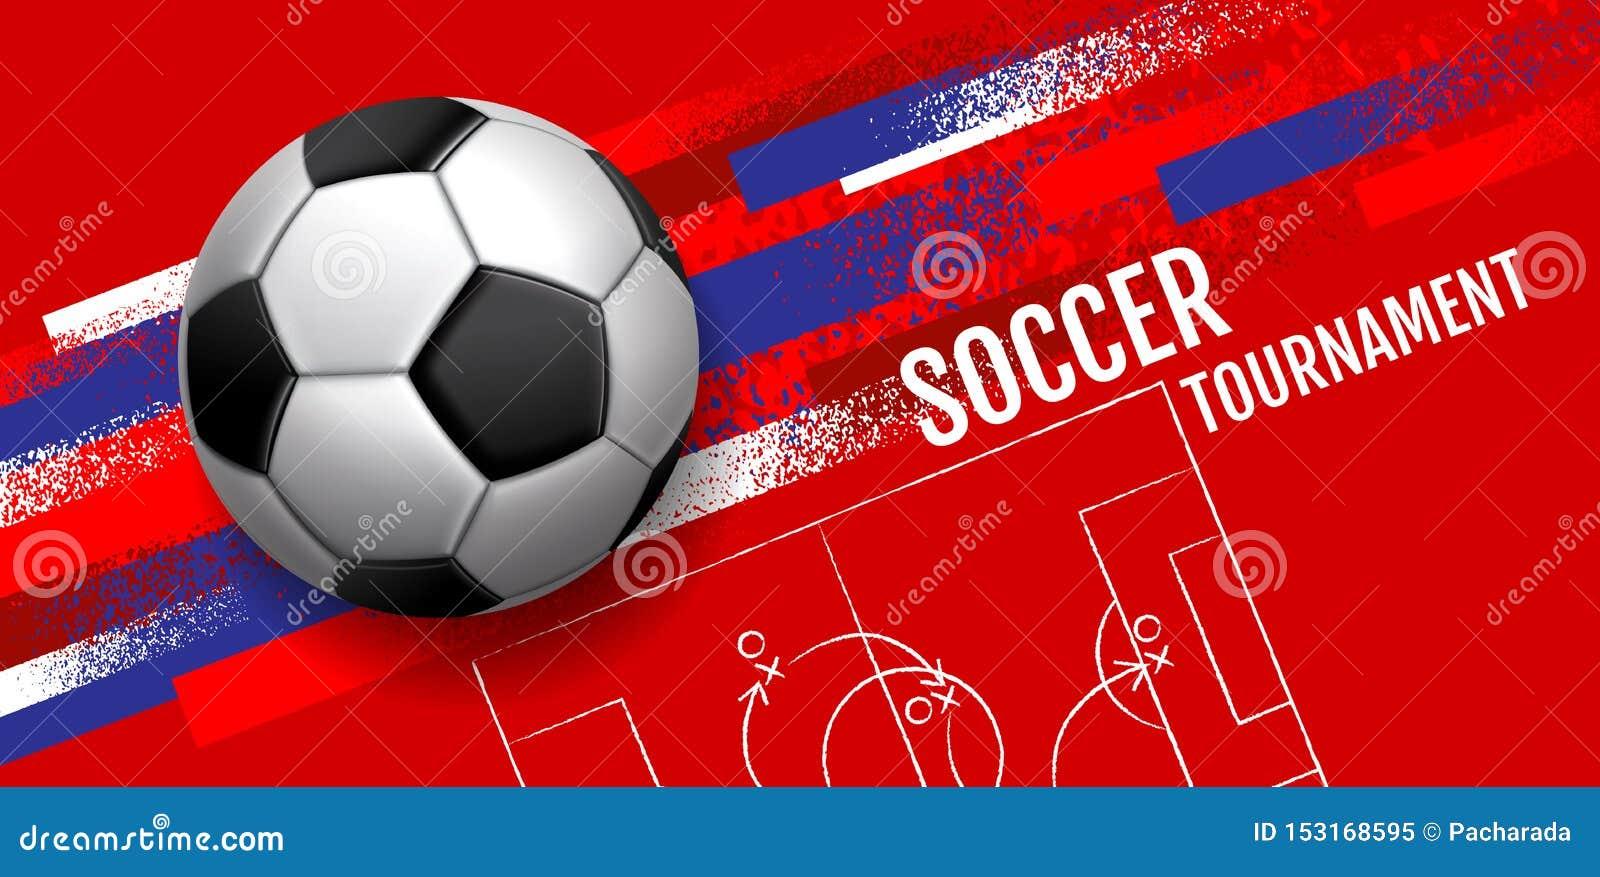 Template Sport Layout Design, grunge Design, Brush ,speed, Graphic Illustration, Football, Soccer, Vector Illustration